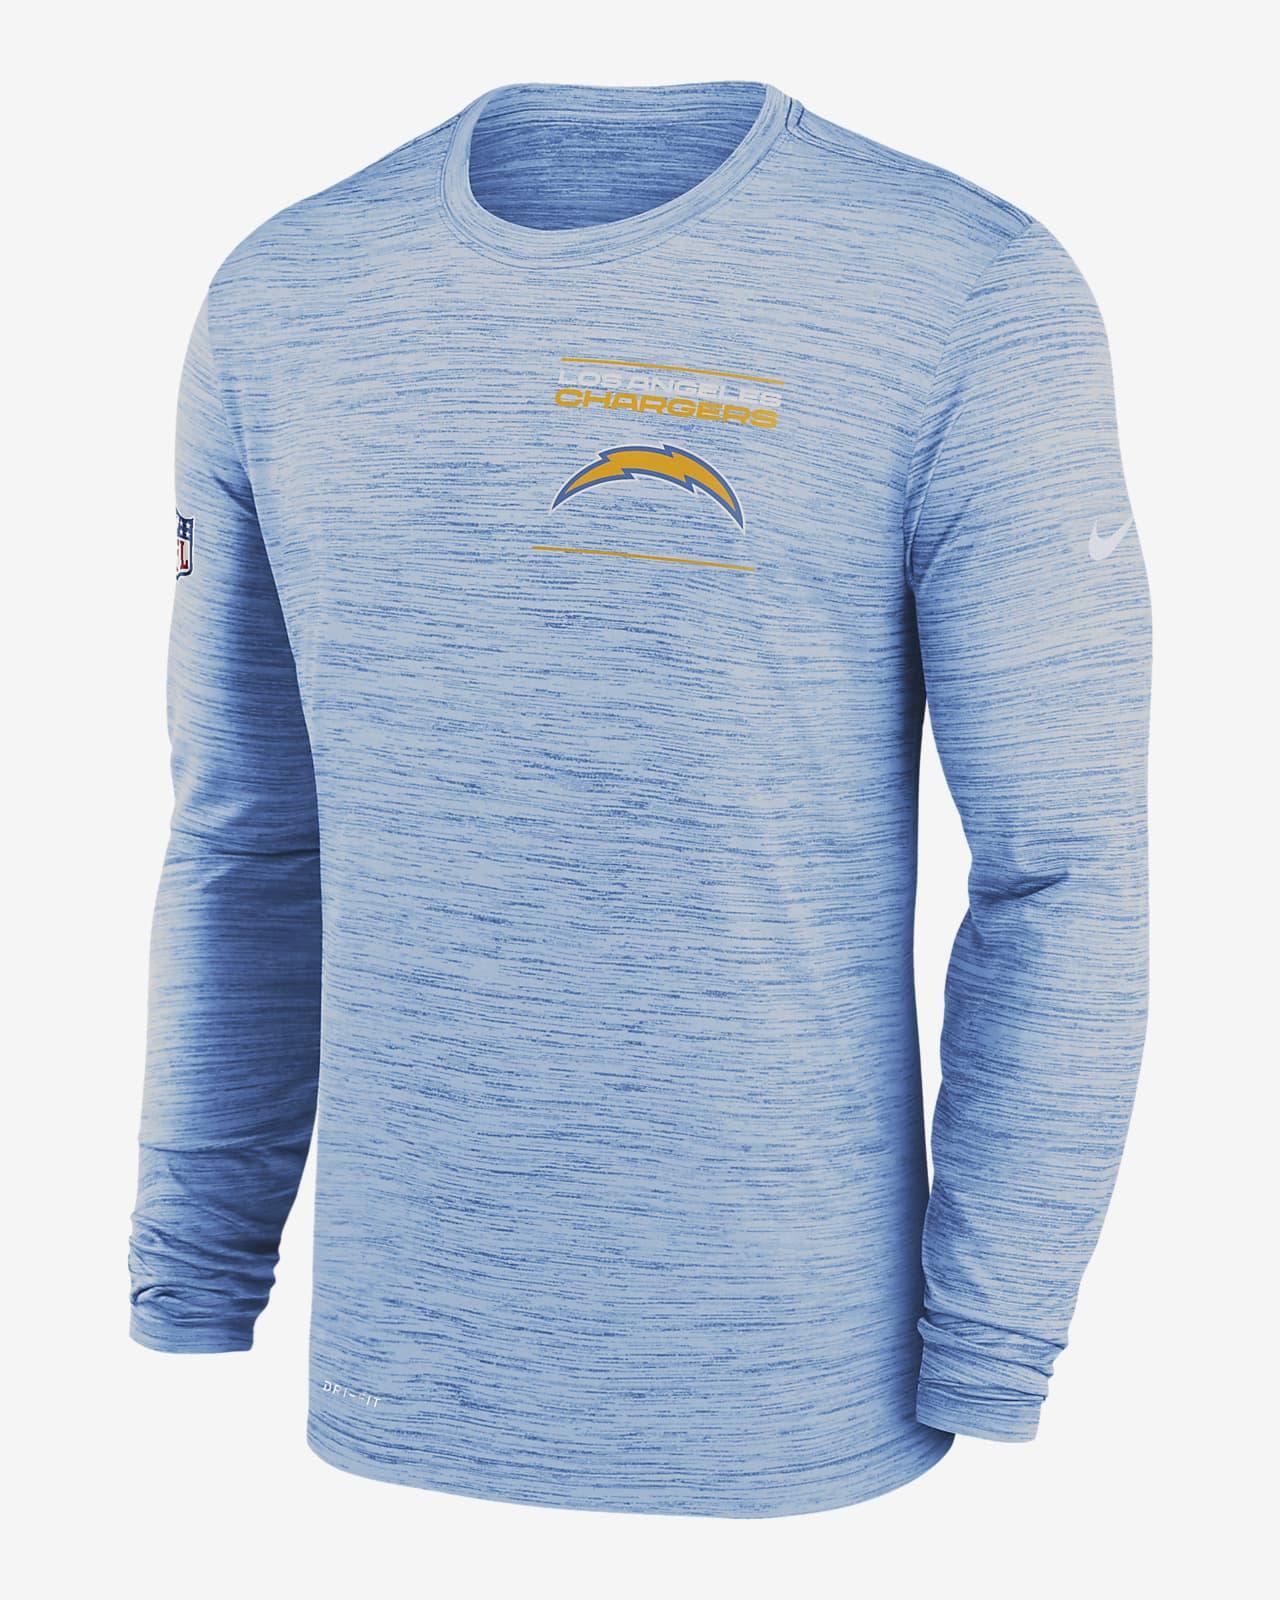 Nike Dri-FIT Sideline Velocity Legend (NFL Los Angeles Chargers) Men's Long-Sleeve T-Shirt